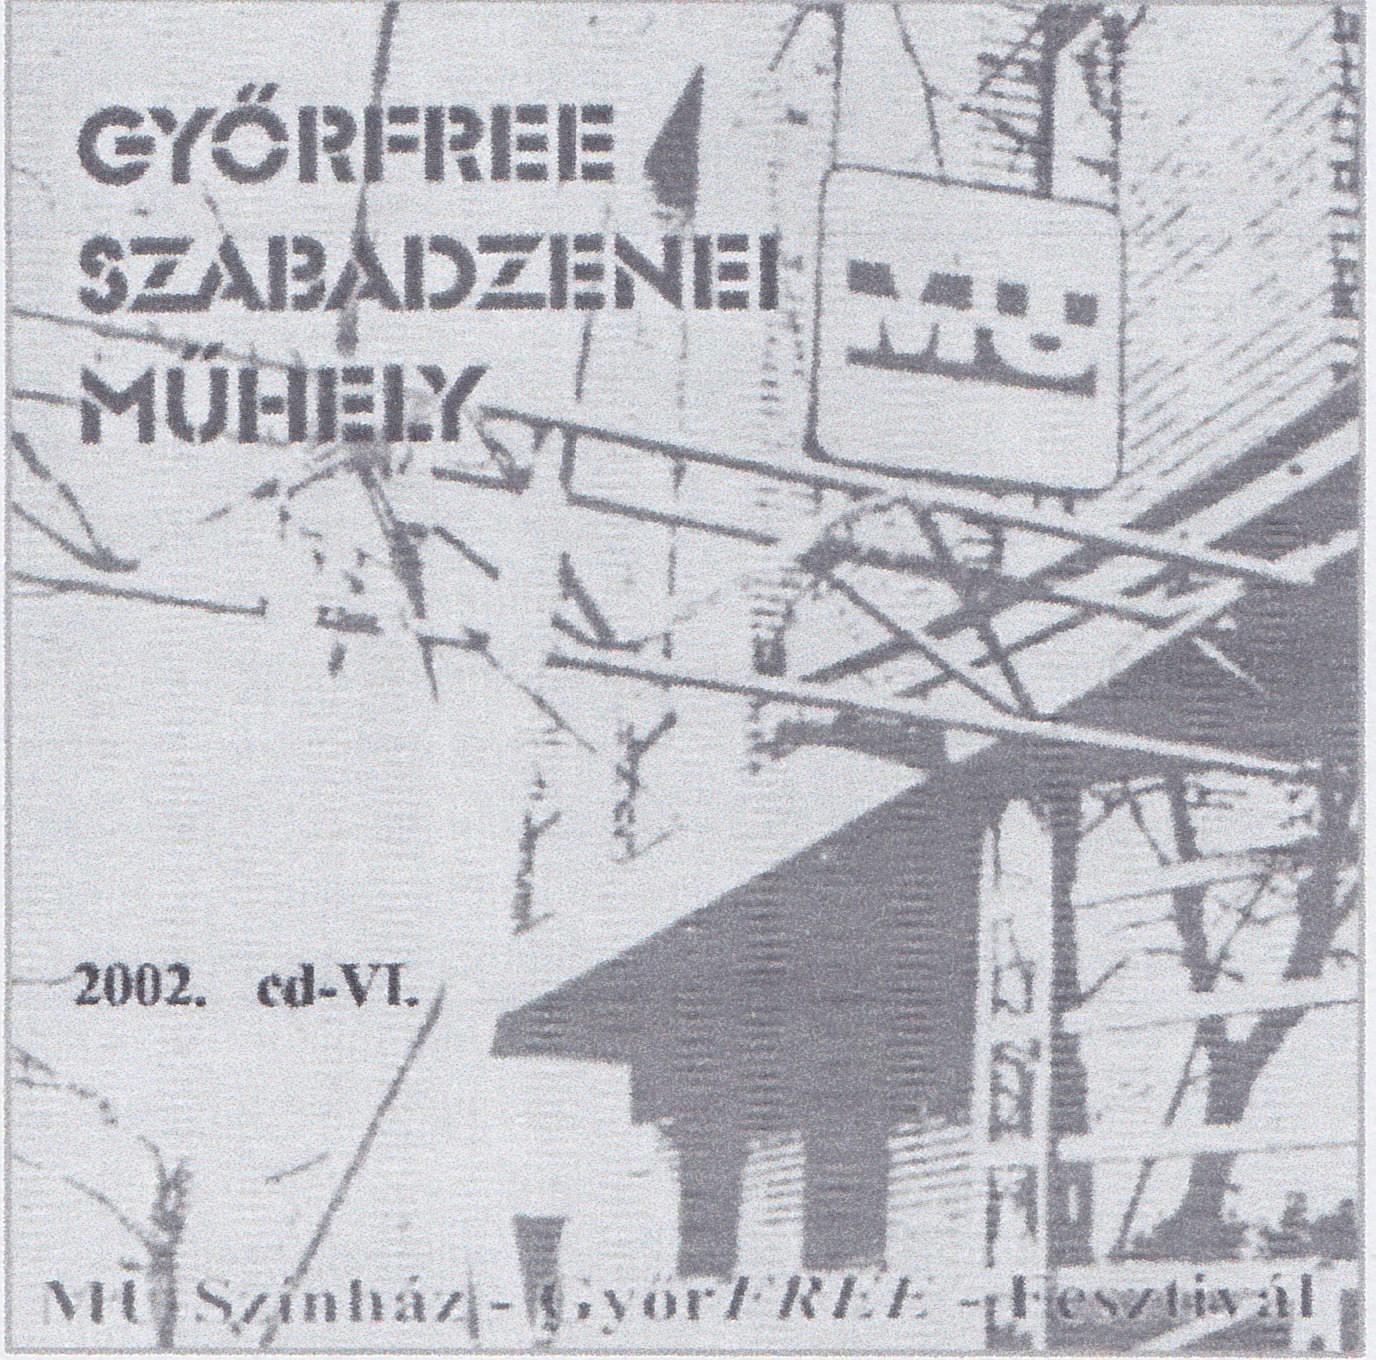 Györ Free